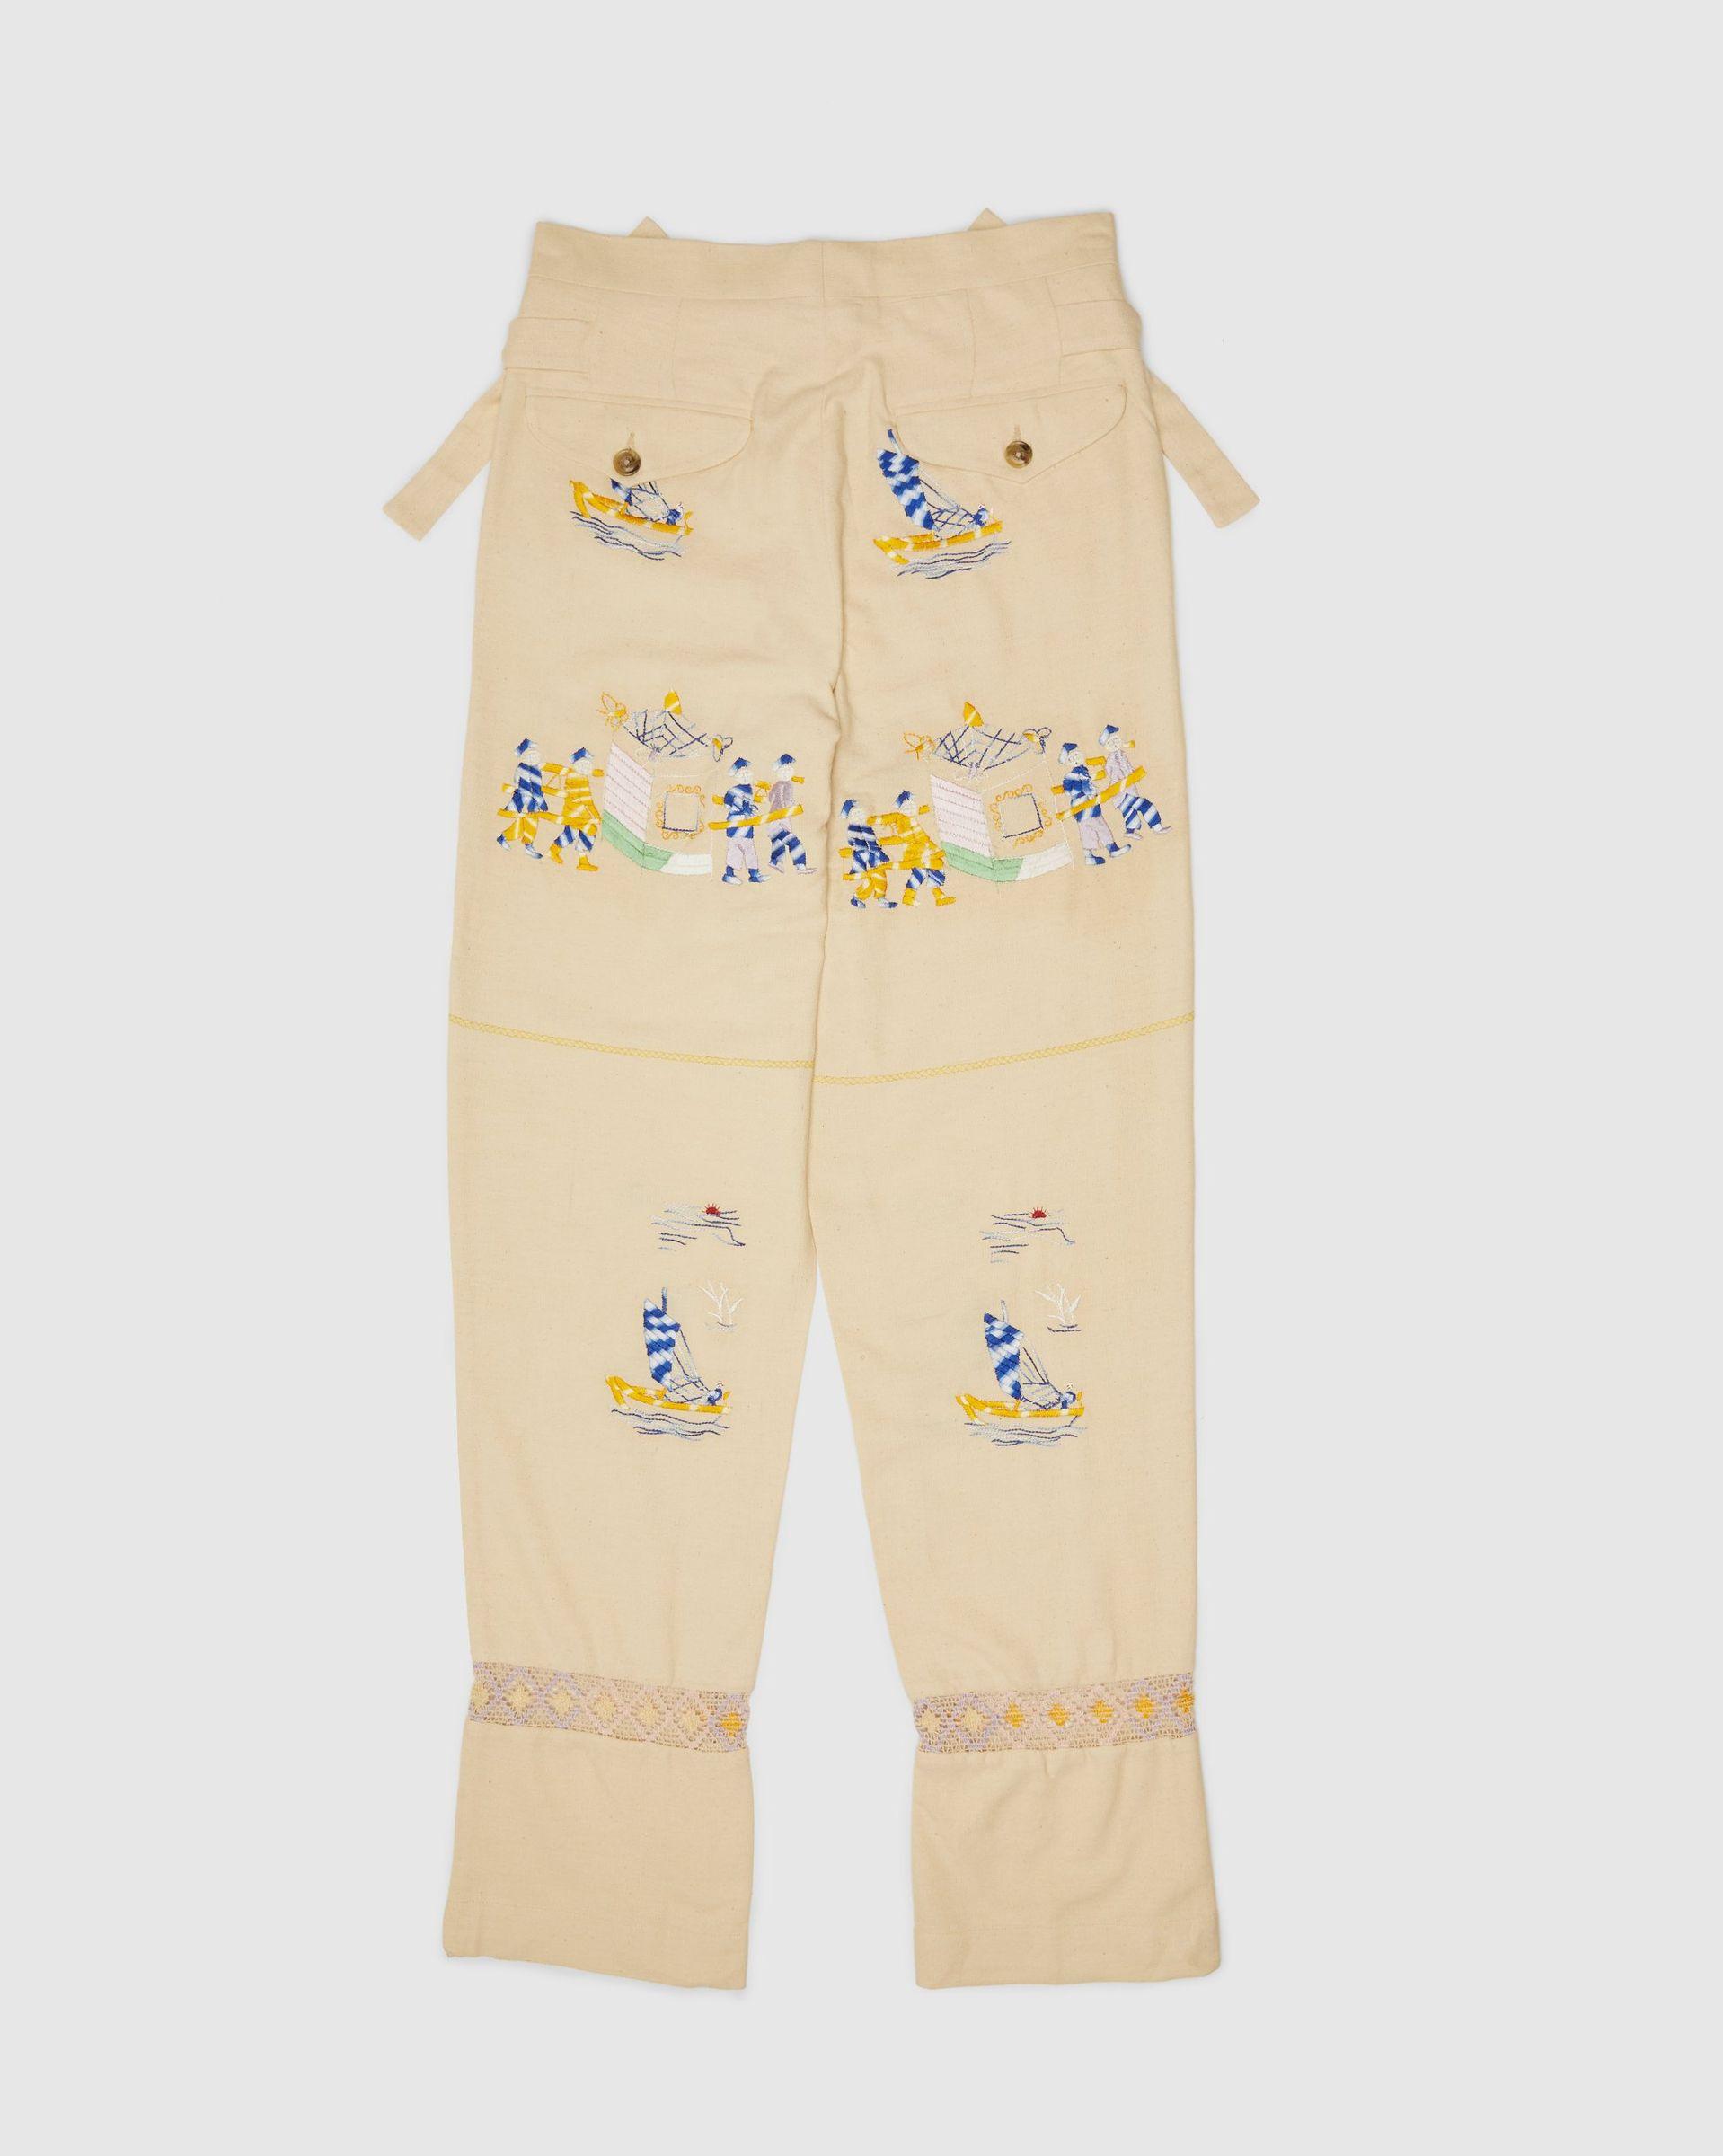 BODE - Sailing Tableau Trousers Tan - Image 2